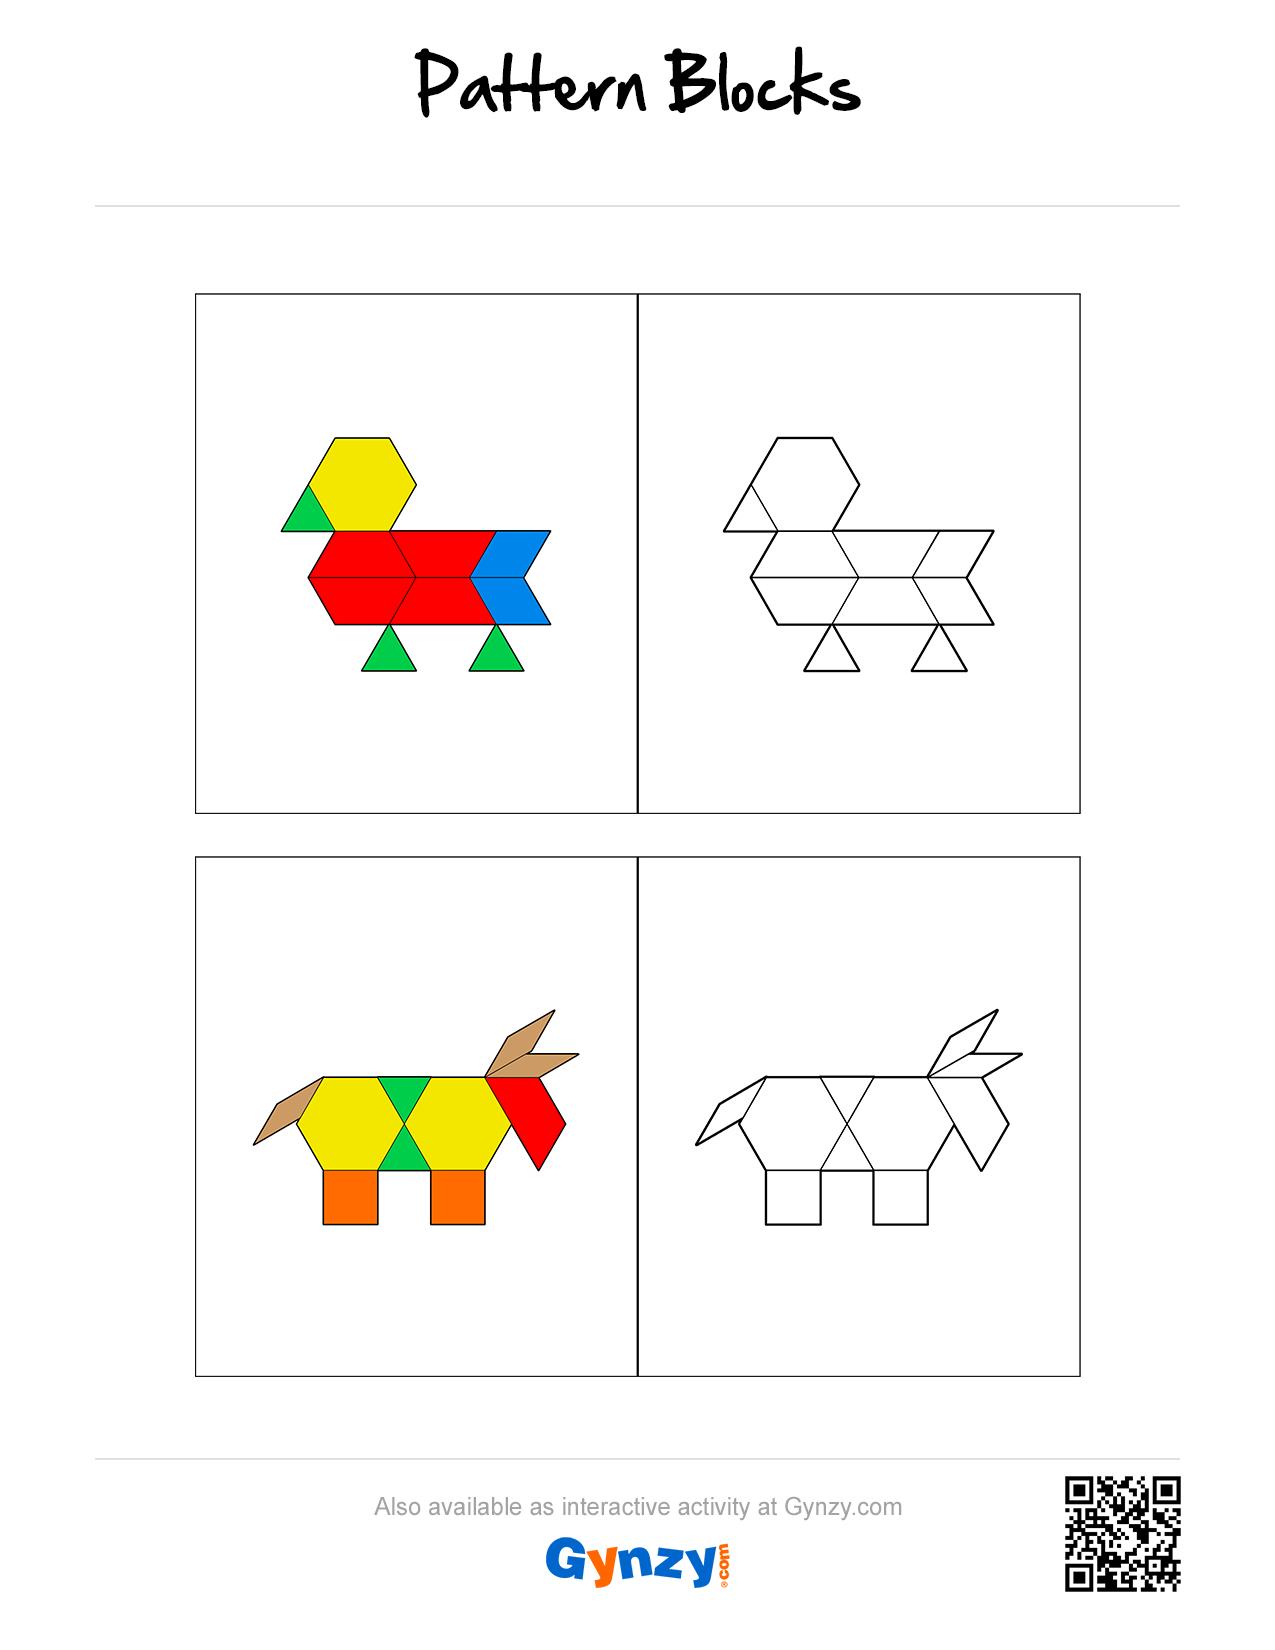 Pattern Blocks Mosaic Build Patterns Create And Solve